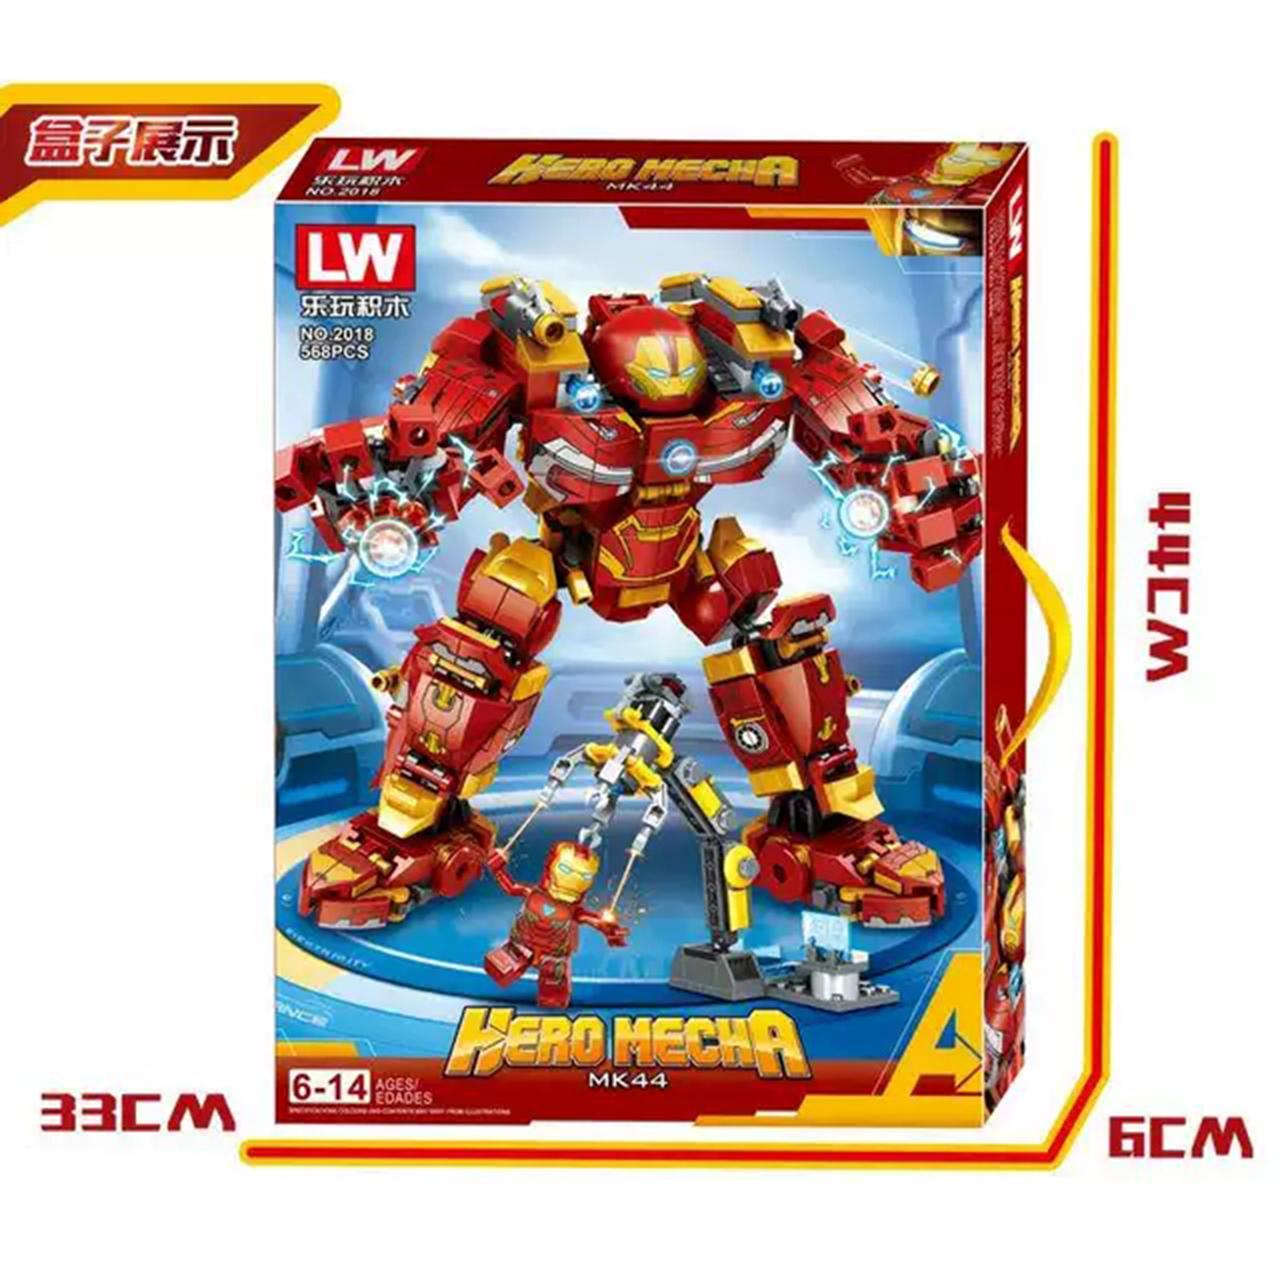 Lego Ninjago Iron Man Người Sắt - LW2018